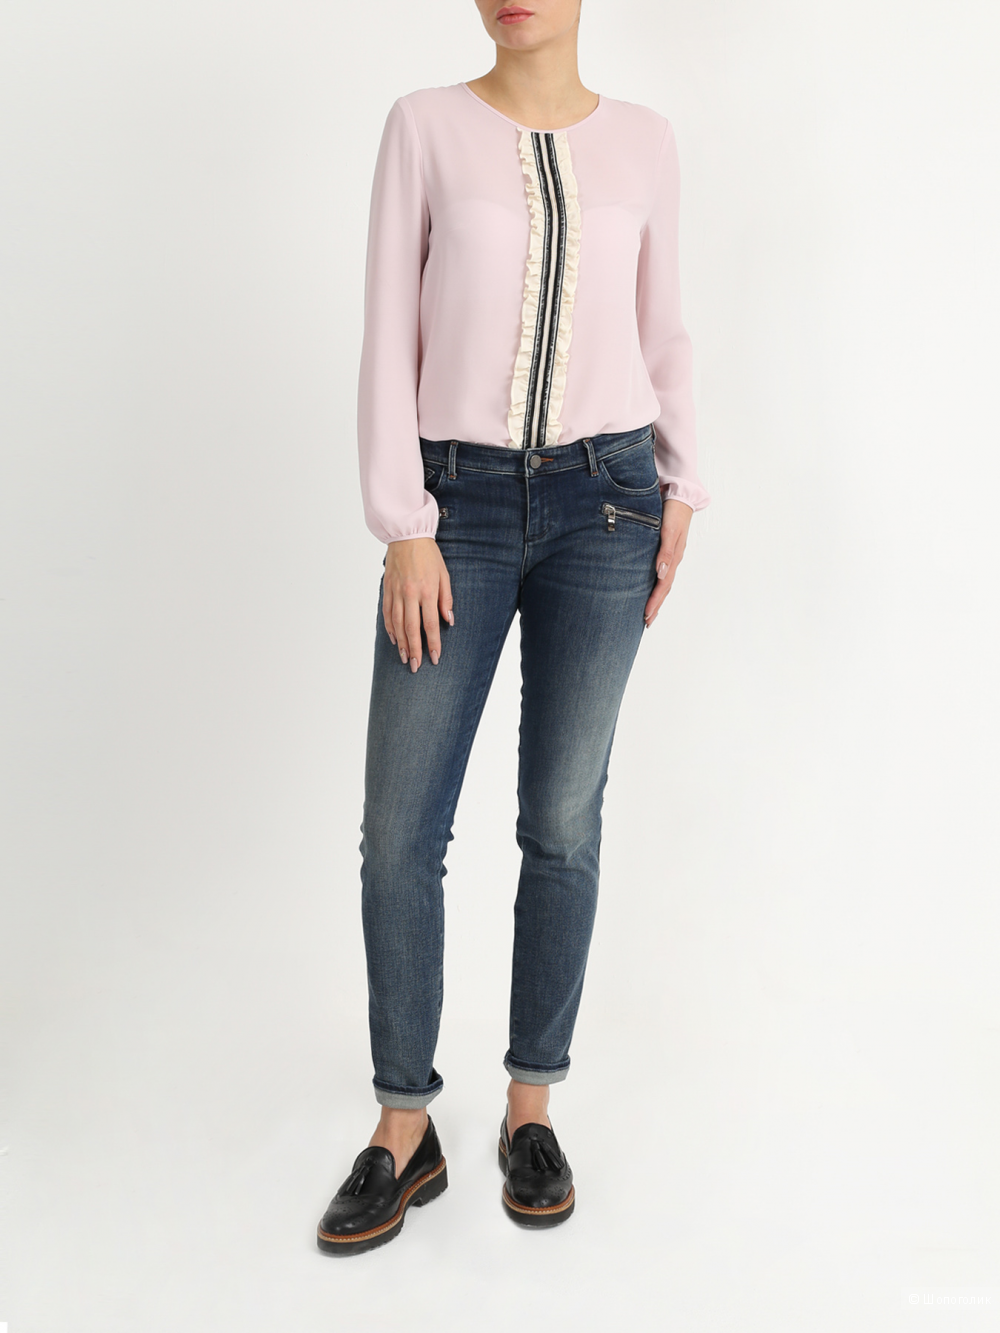 Блуза Korpo Two , 52 размер